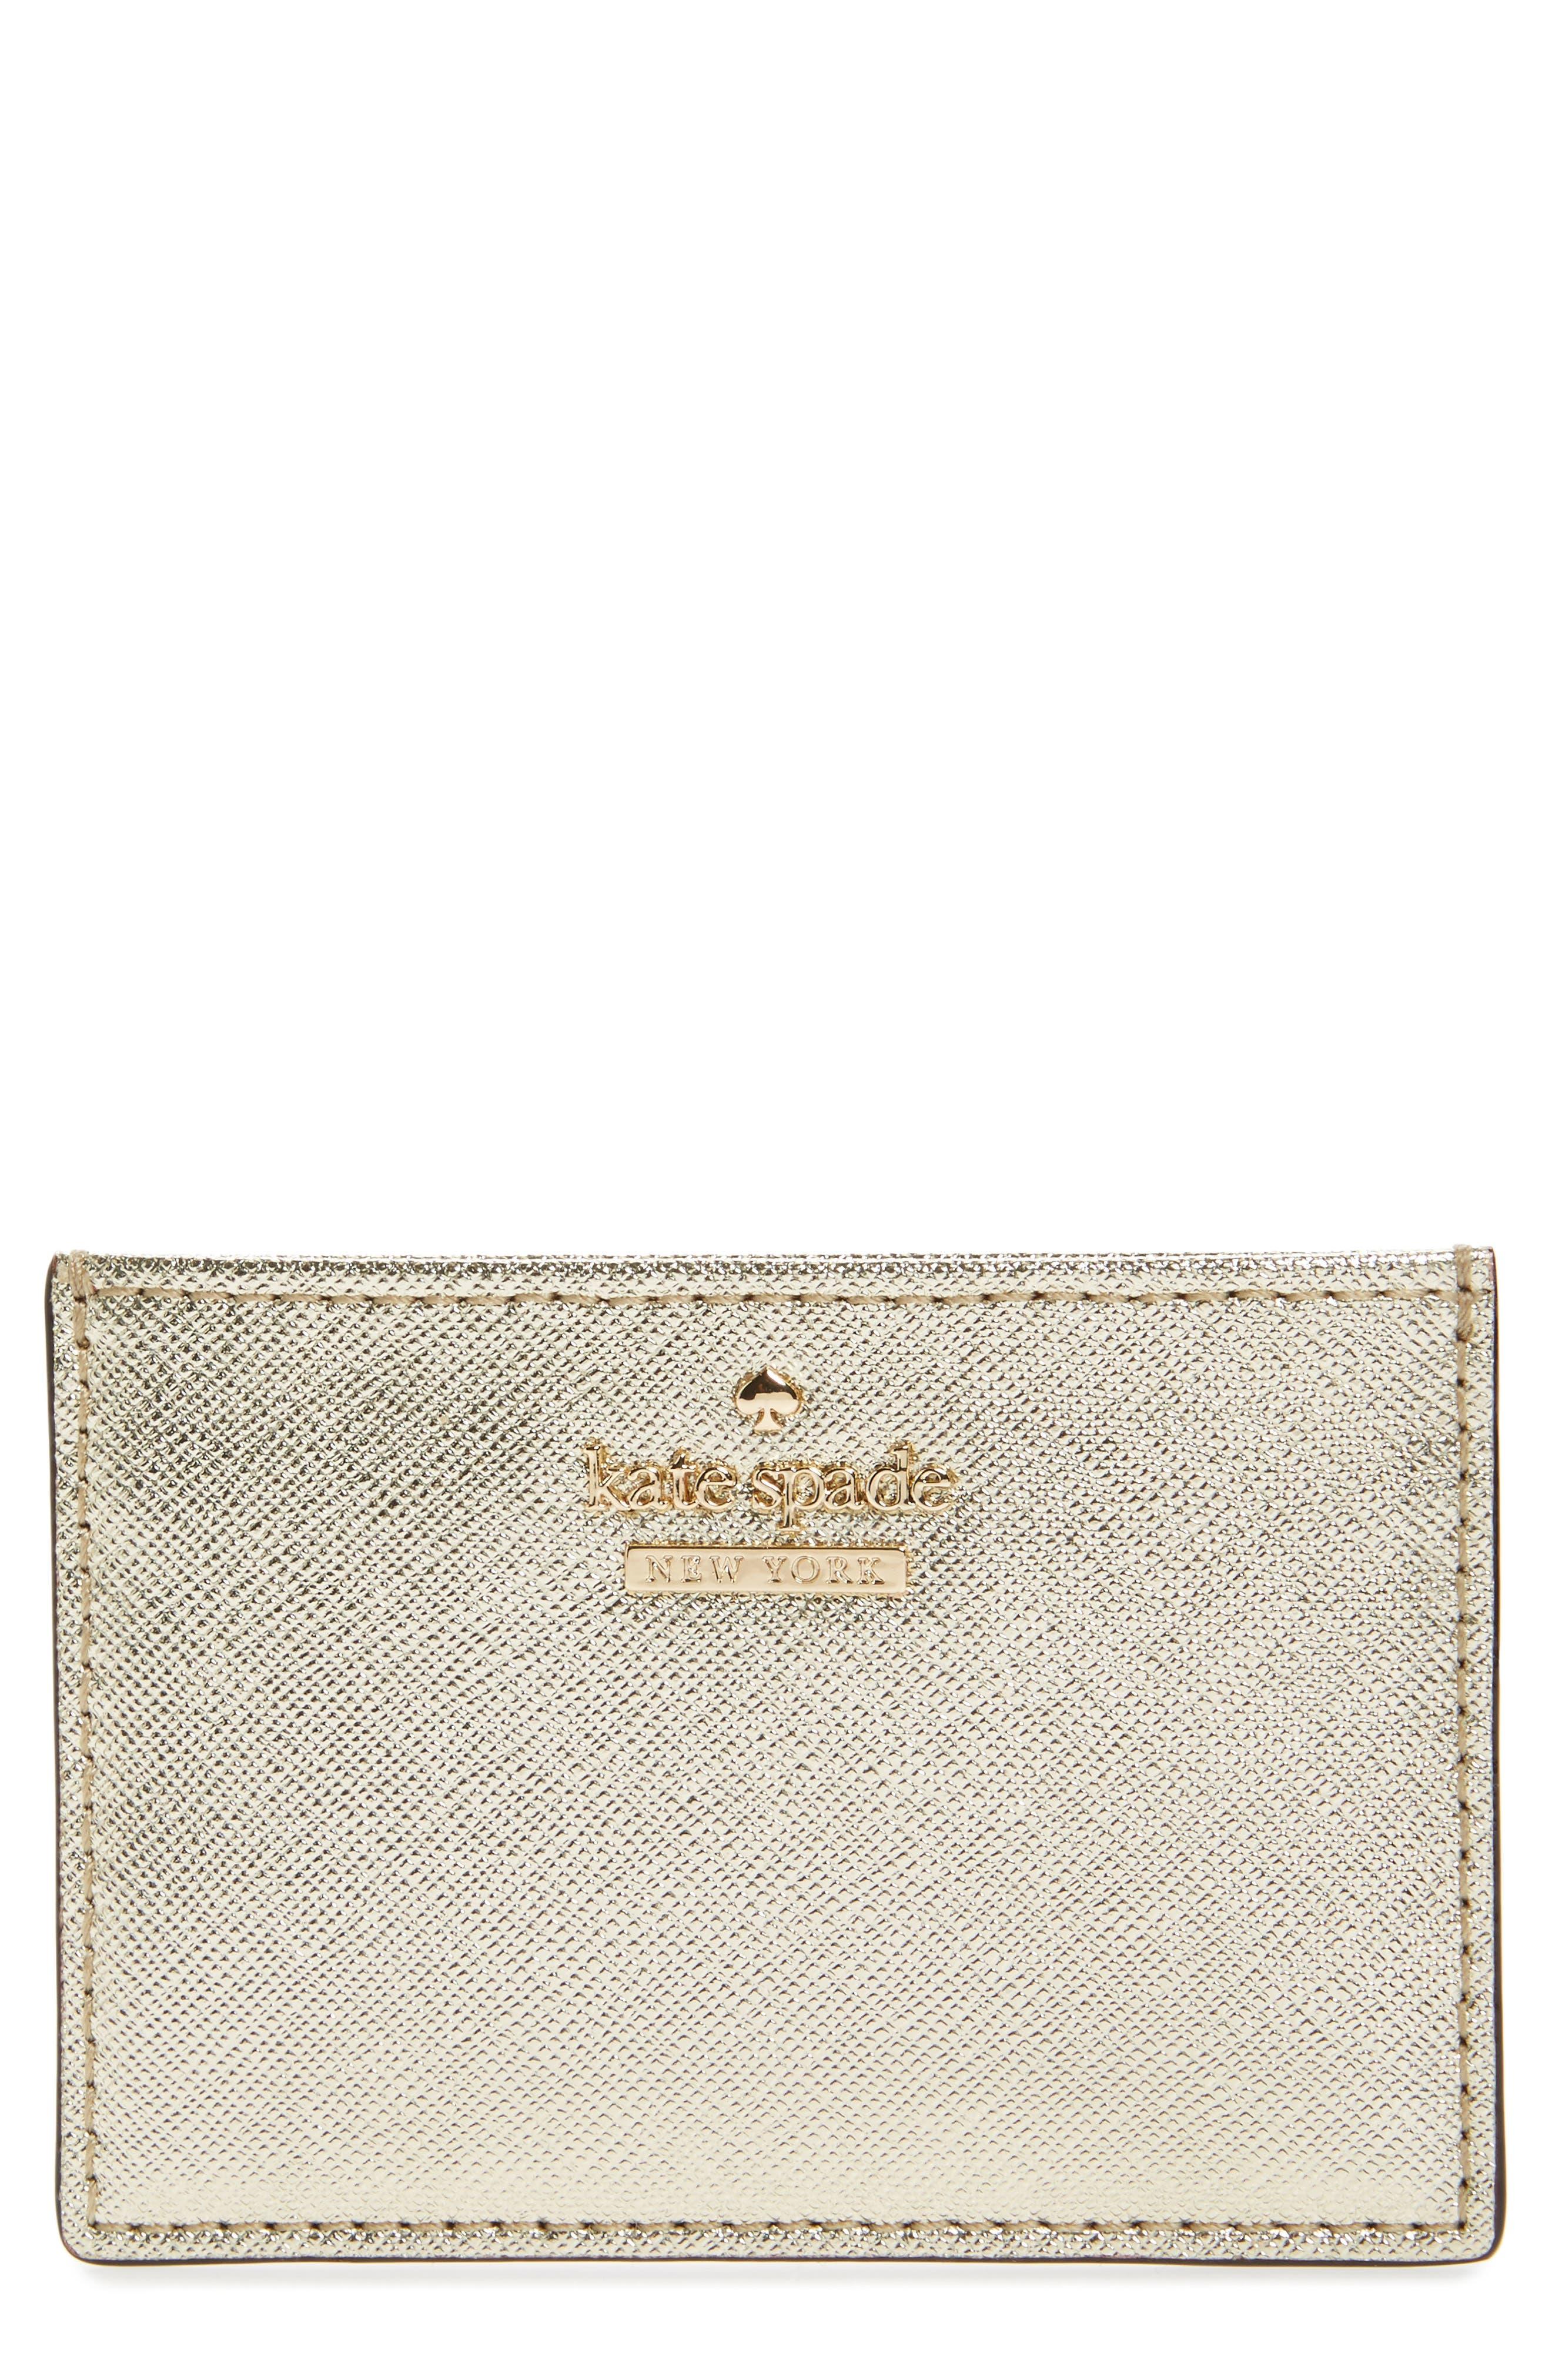 Kate Spade New York Wallets & Card Casesfor Women